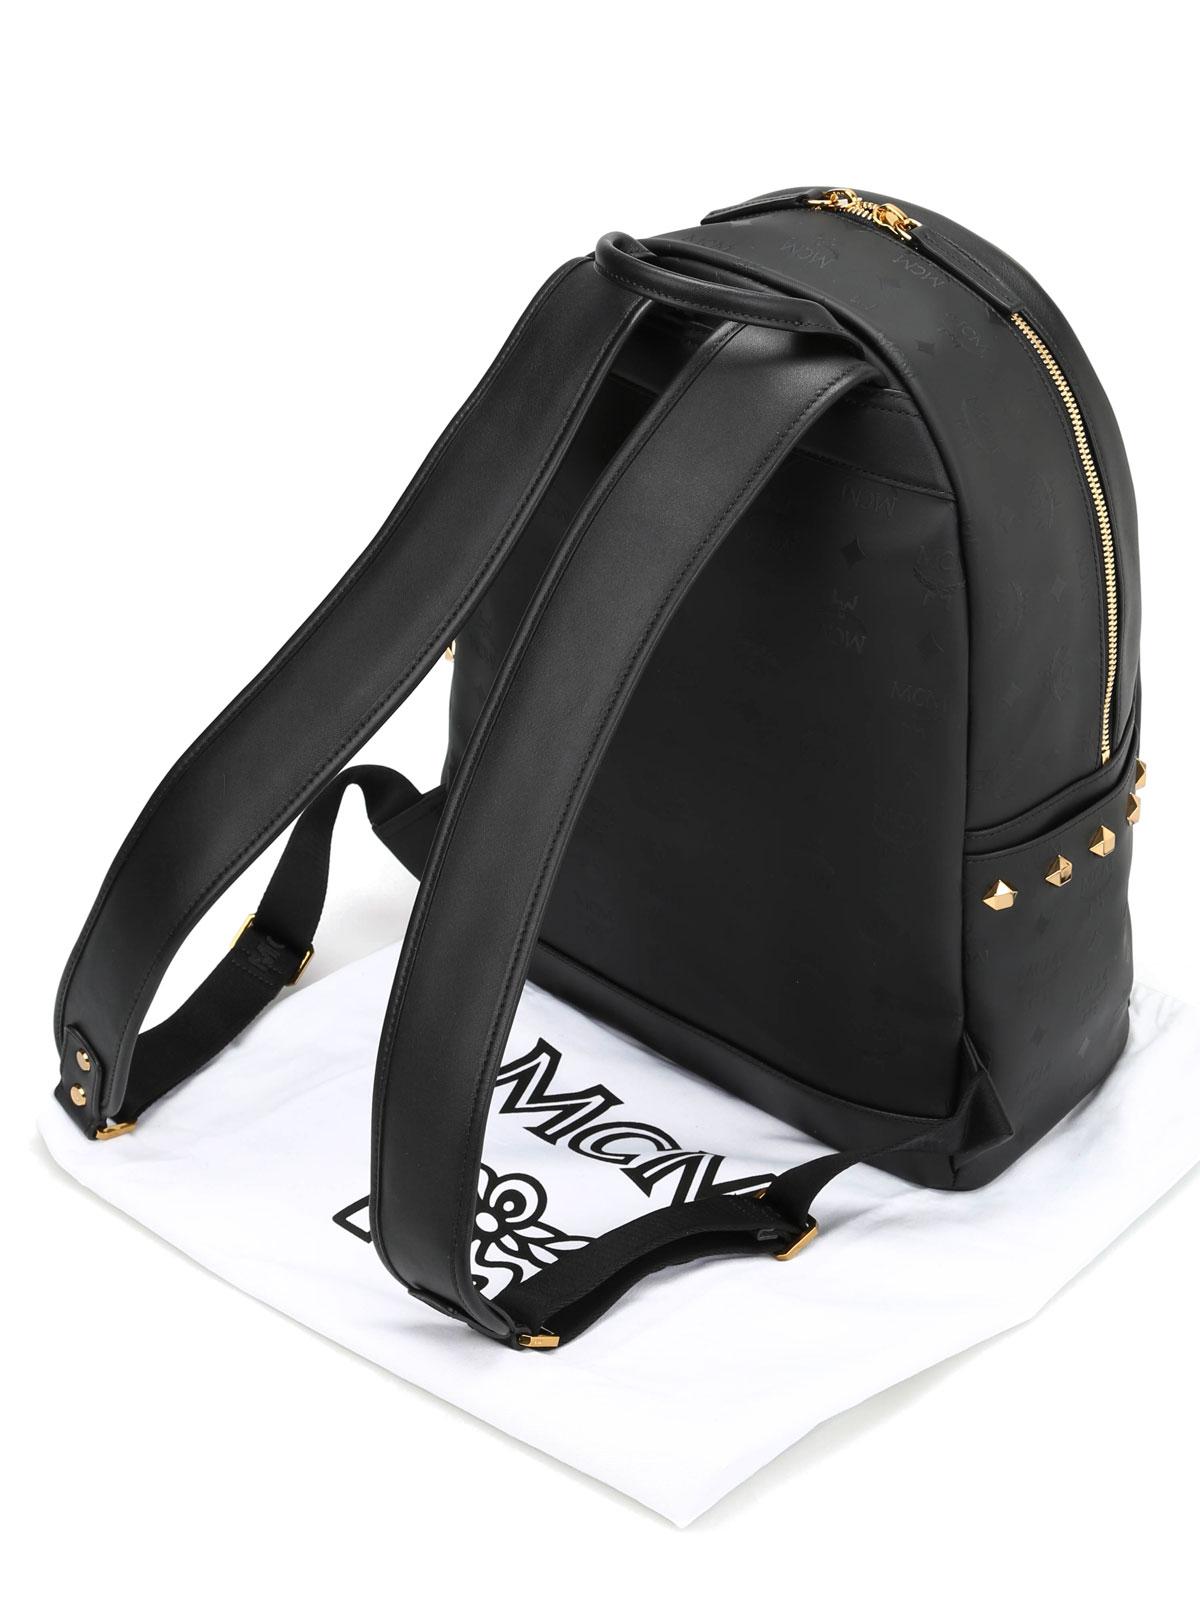 492793f9ad3fd Mcm - Medium Stark Odeon backpack - backpacks - MMK6SVH43 BK001